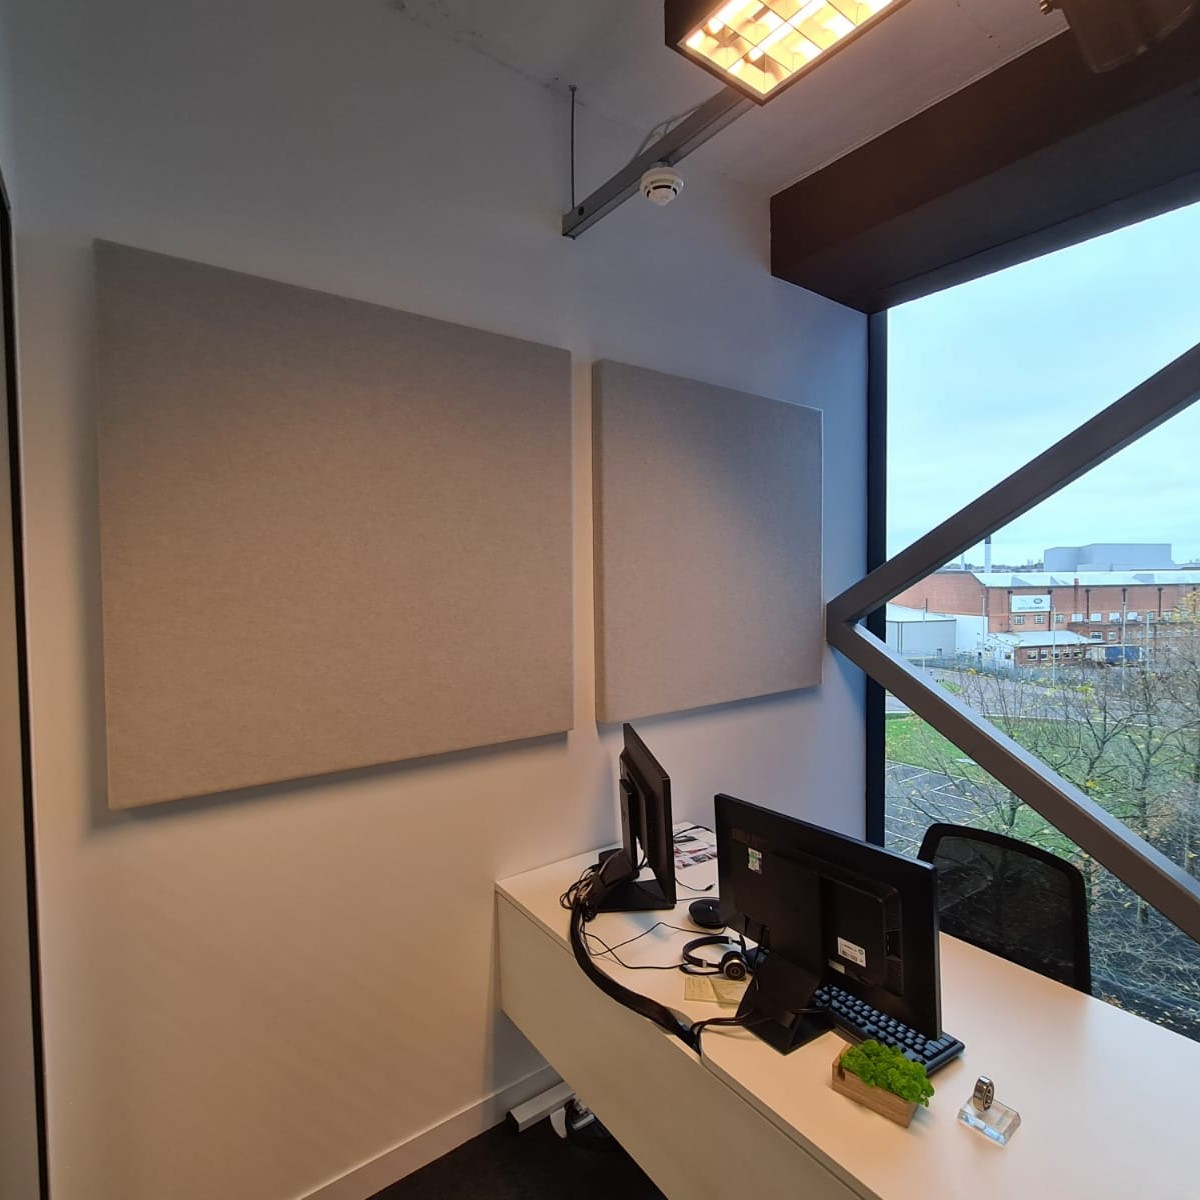 Autex Quietspace And Ecophon Solo Installation At Schaeffler